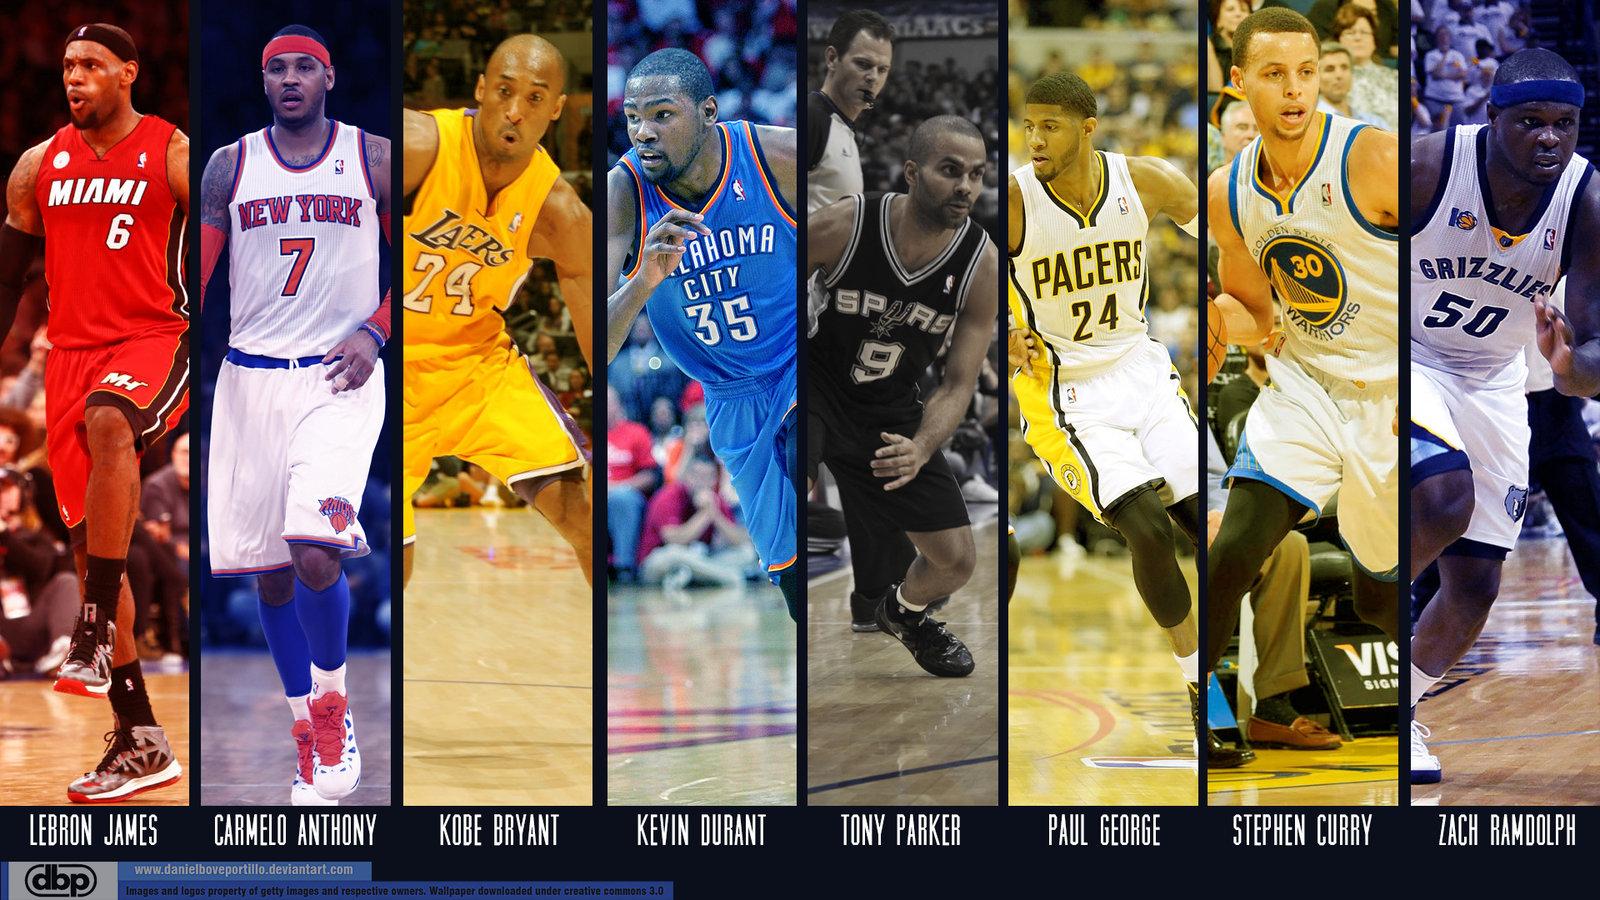 Cool Basketball Player Wallpapers - WallpaperSafari